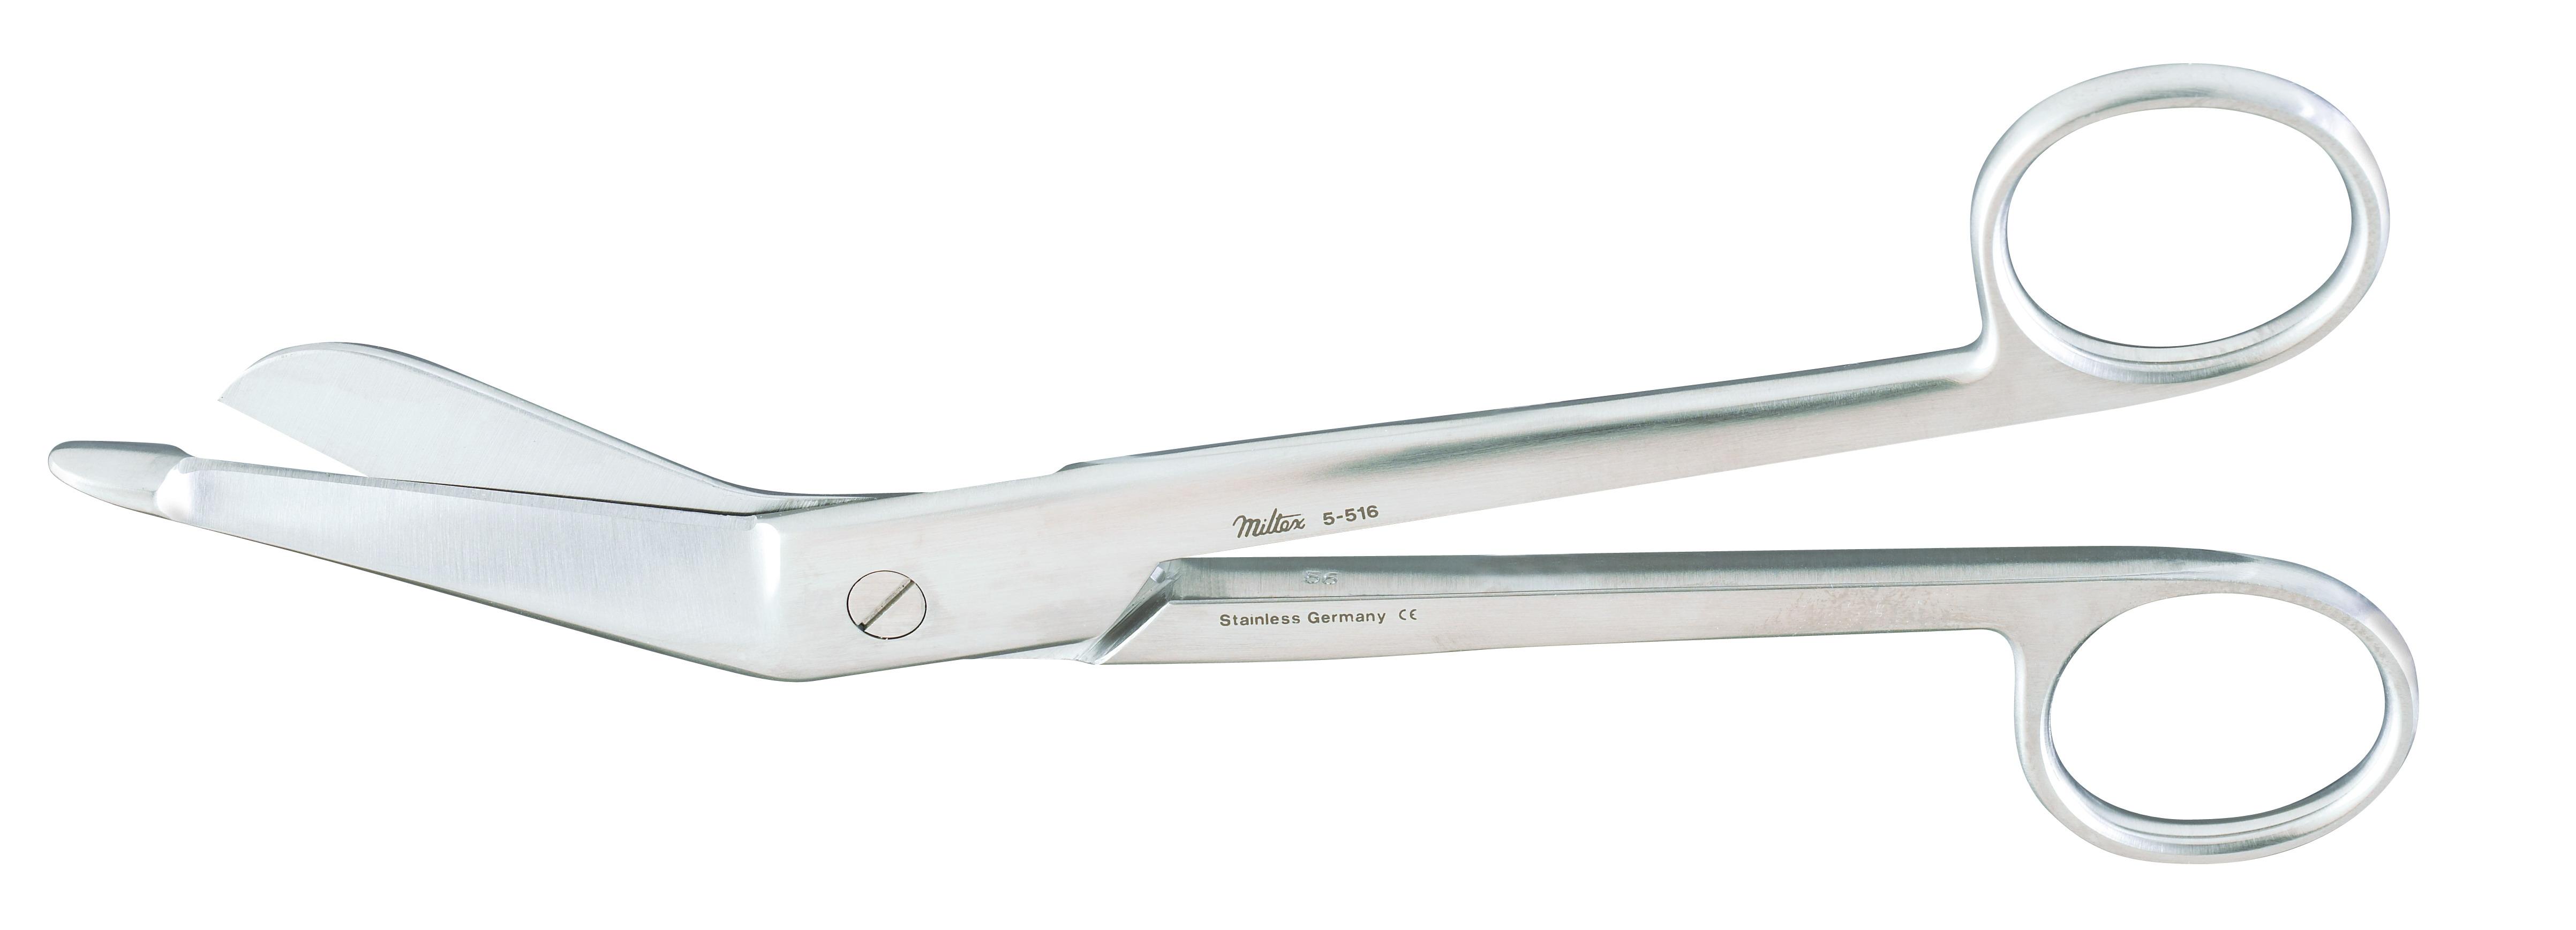 lister-bandage-scissors-7-1-4-184-cm-extra-fine-5-516-miltex.jpg